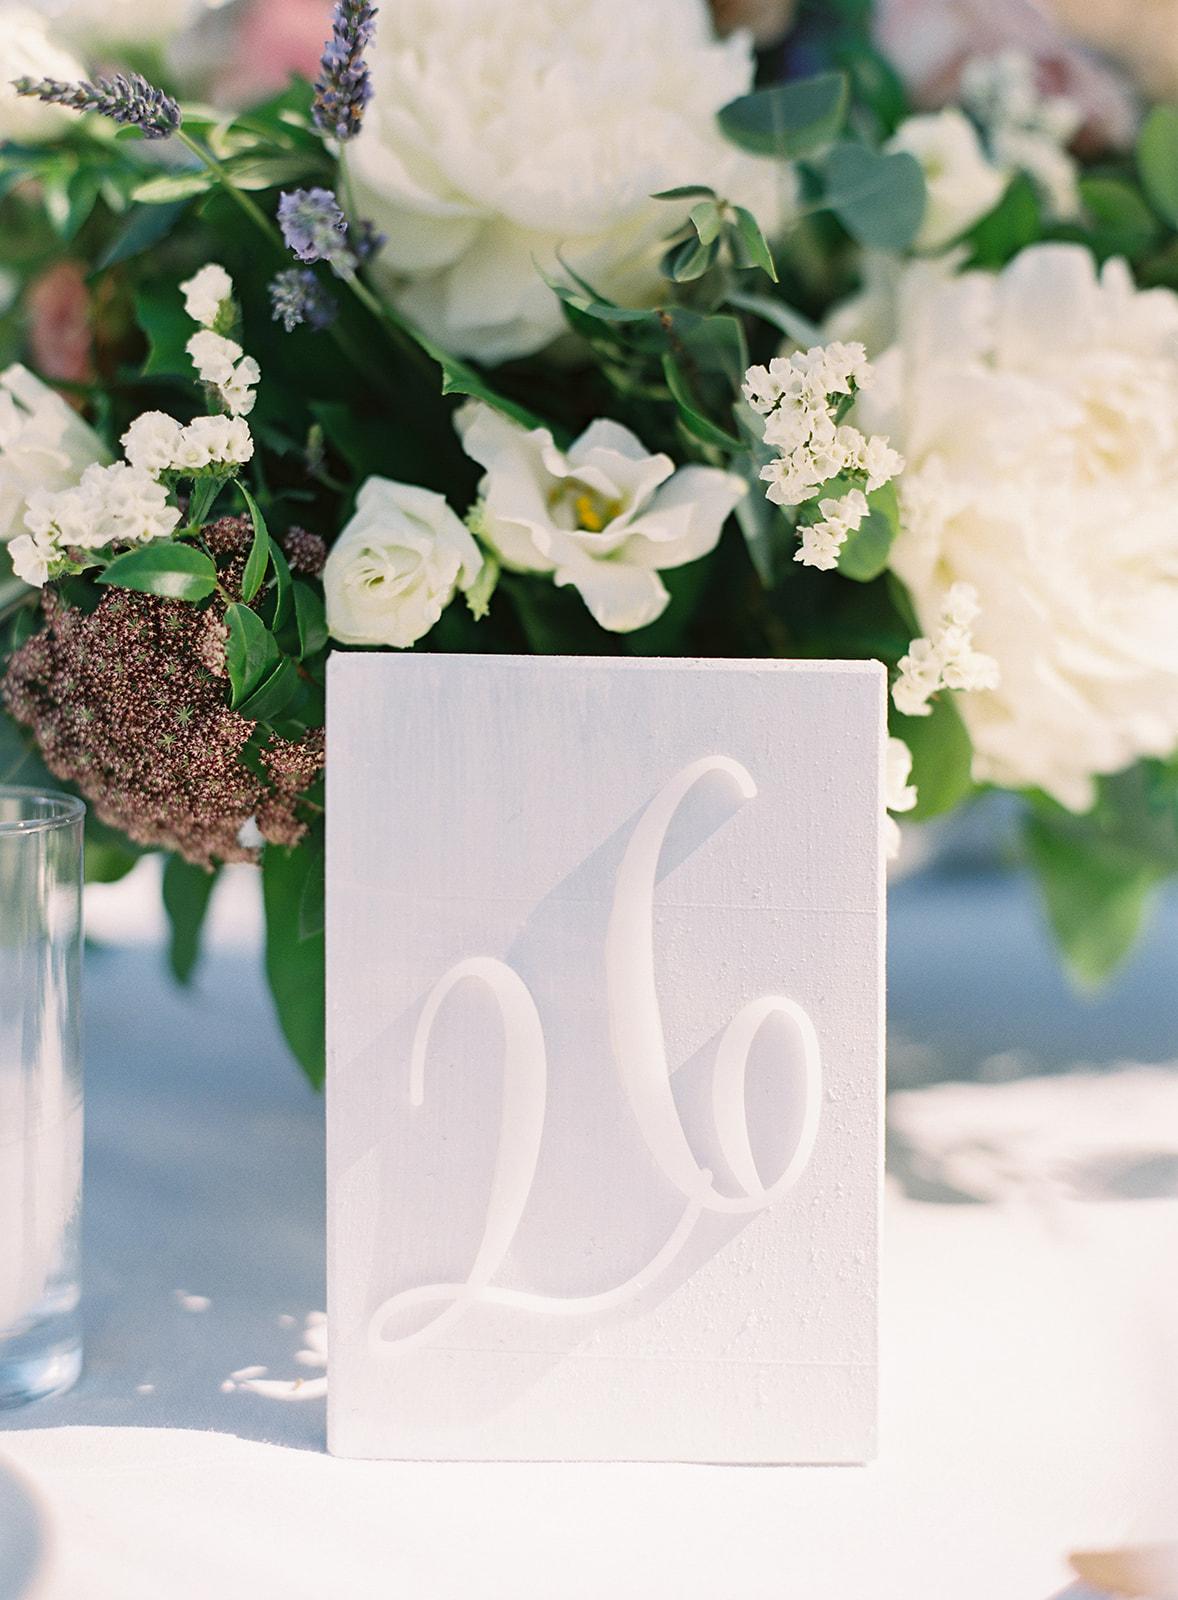 triunfo_creek_winery_wedding-192-jen-huang-jl-325-jen-huang-009964-r1-012.JPG